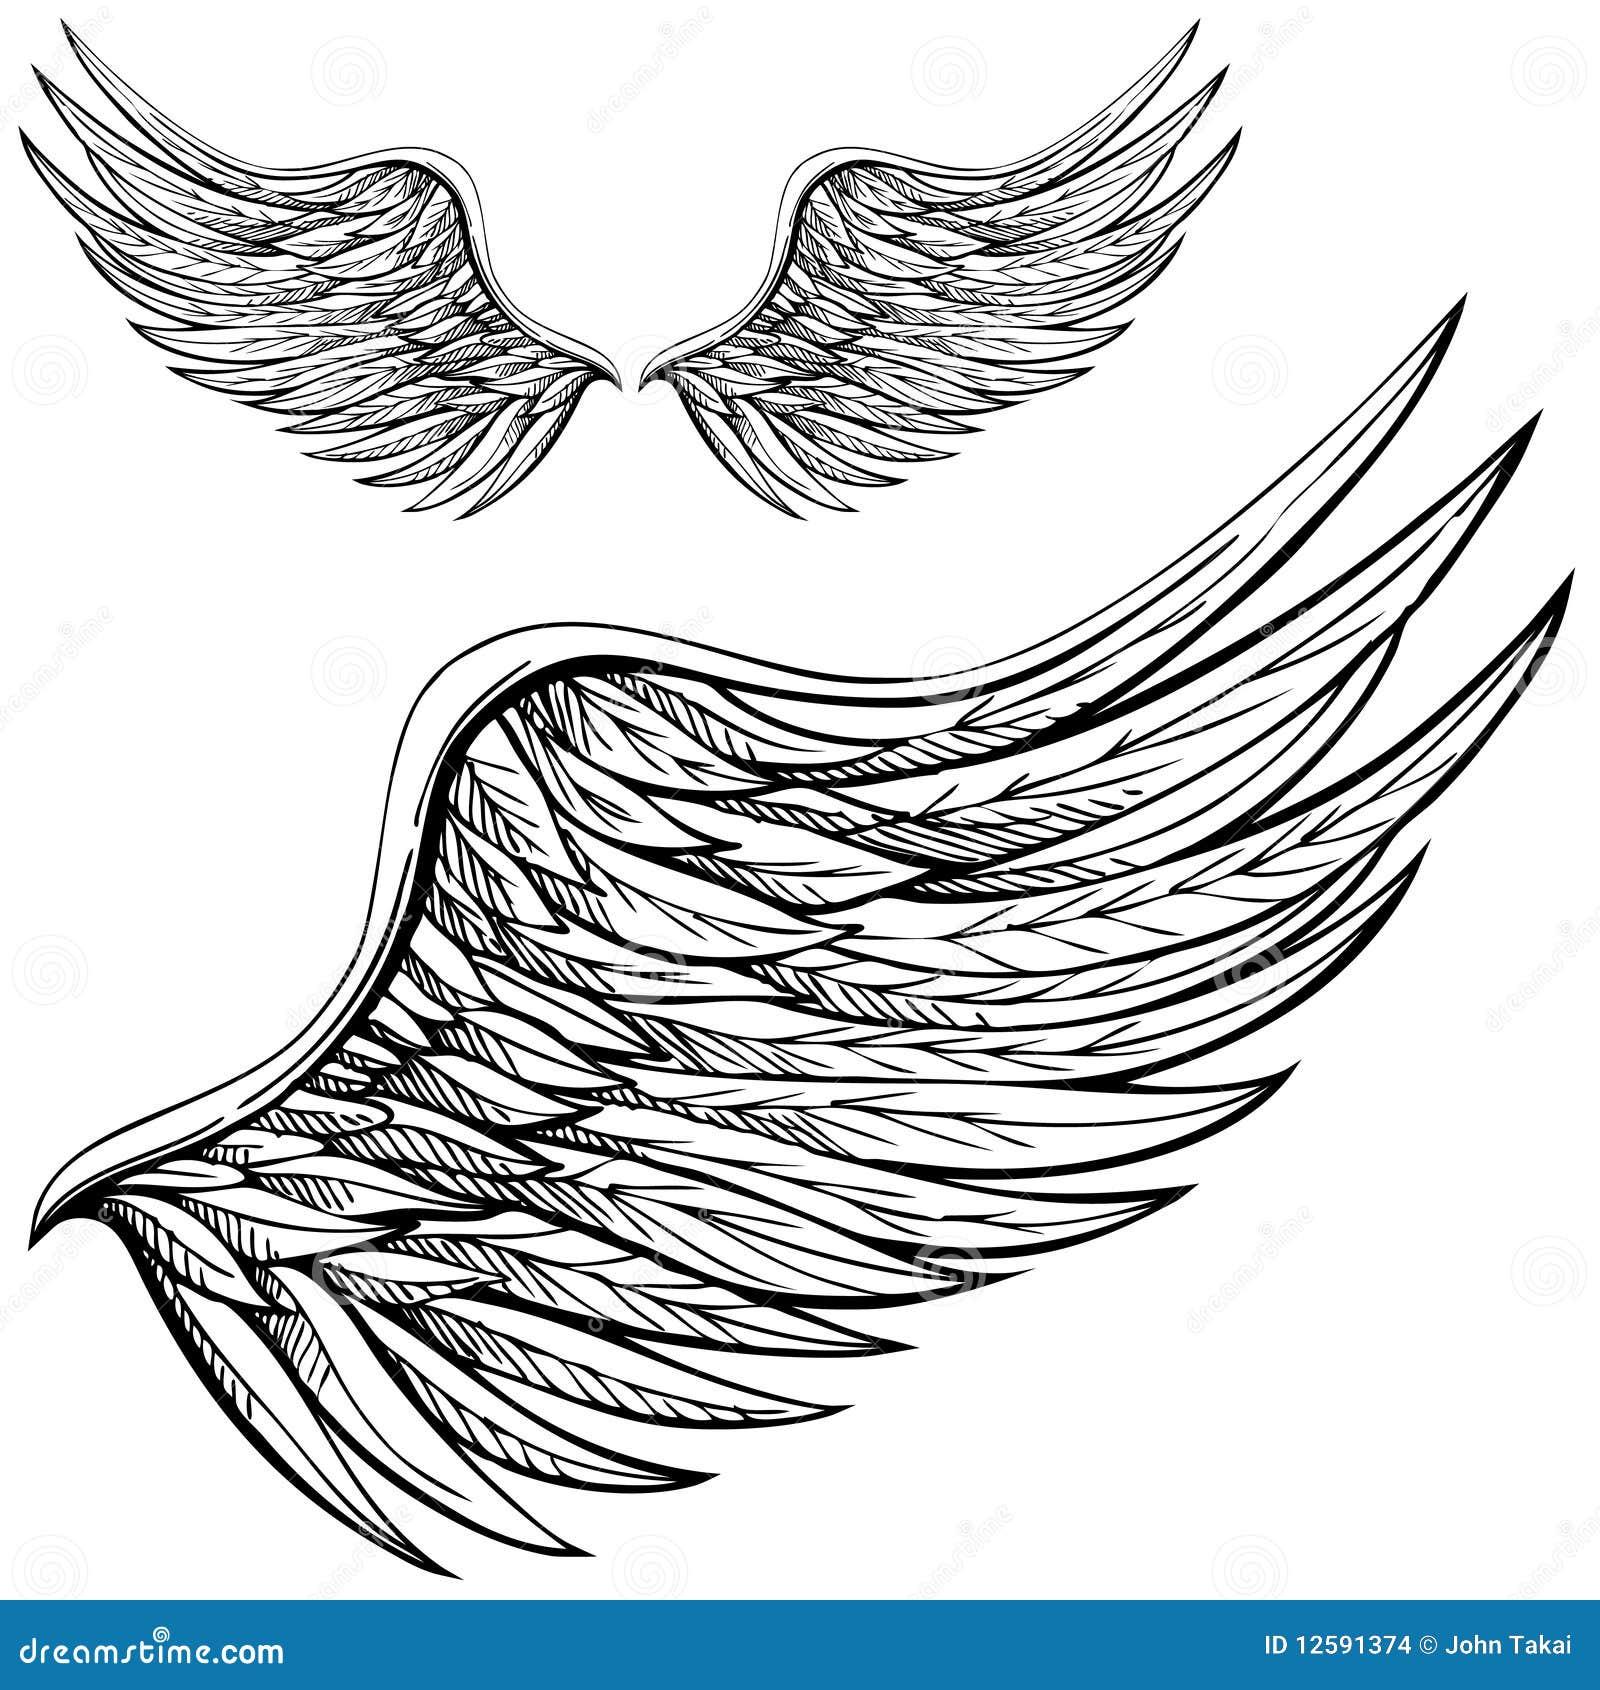 Cartoon Angel Wing Stock Vector. Illustration Of Drawn